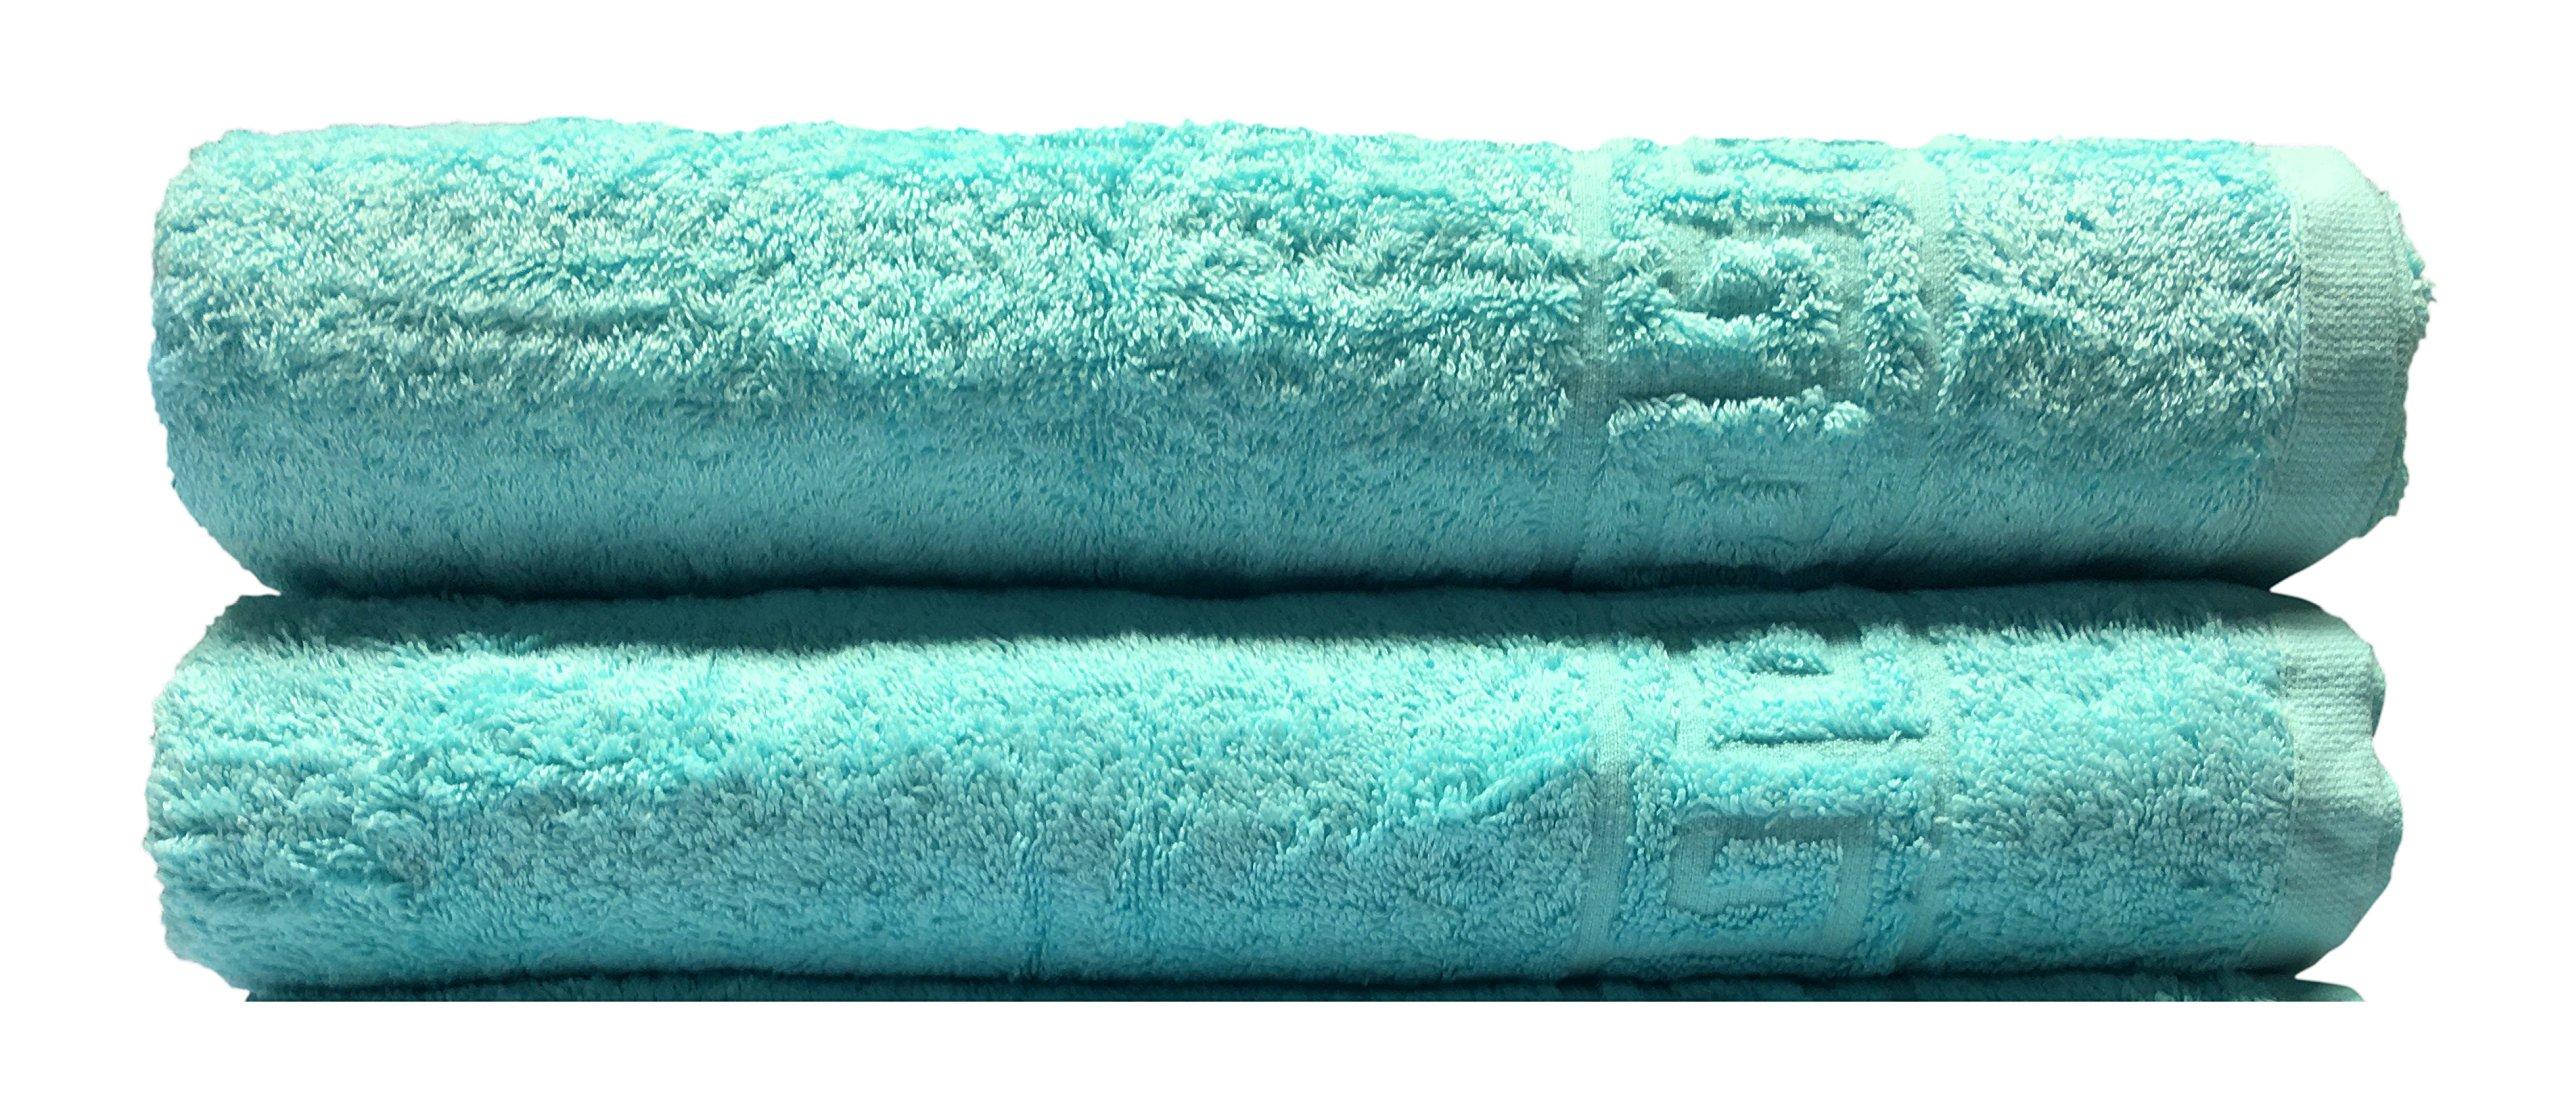 Goza Towels Greek Key Design Cotton Towels (Light Turquoise, Bath Towels - 2 Pack)